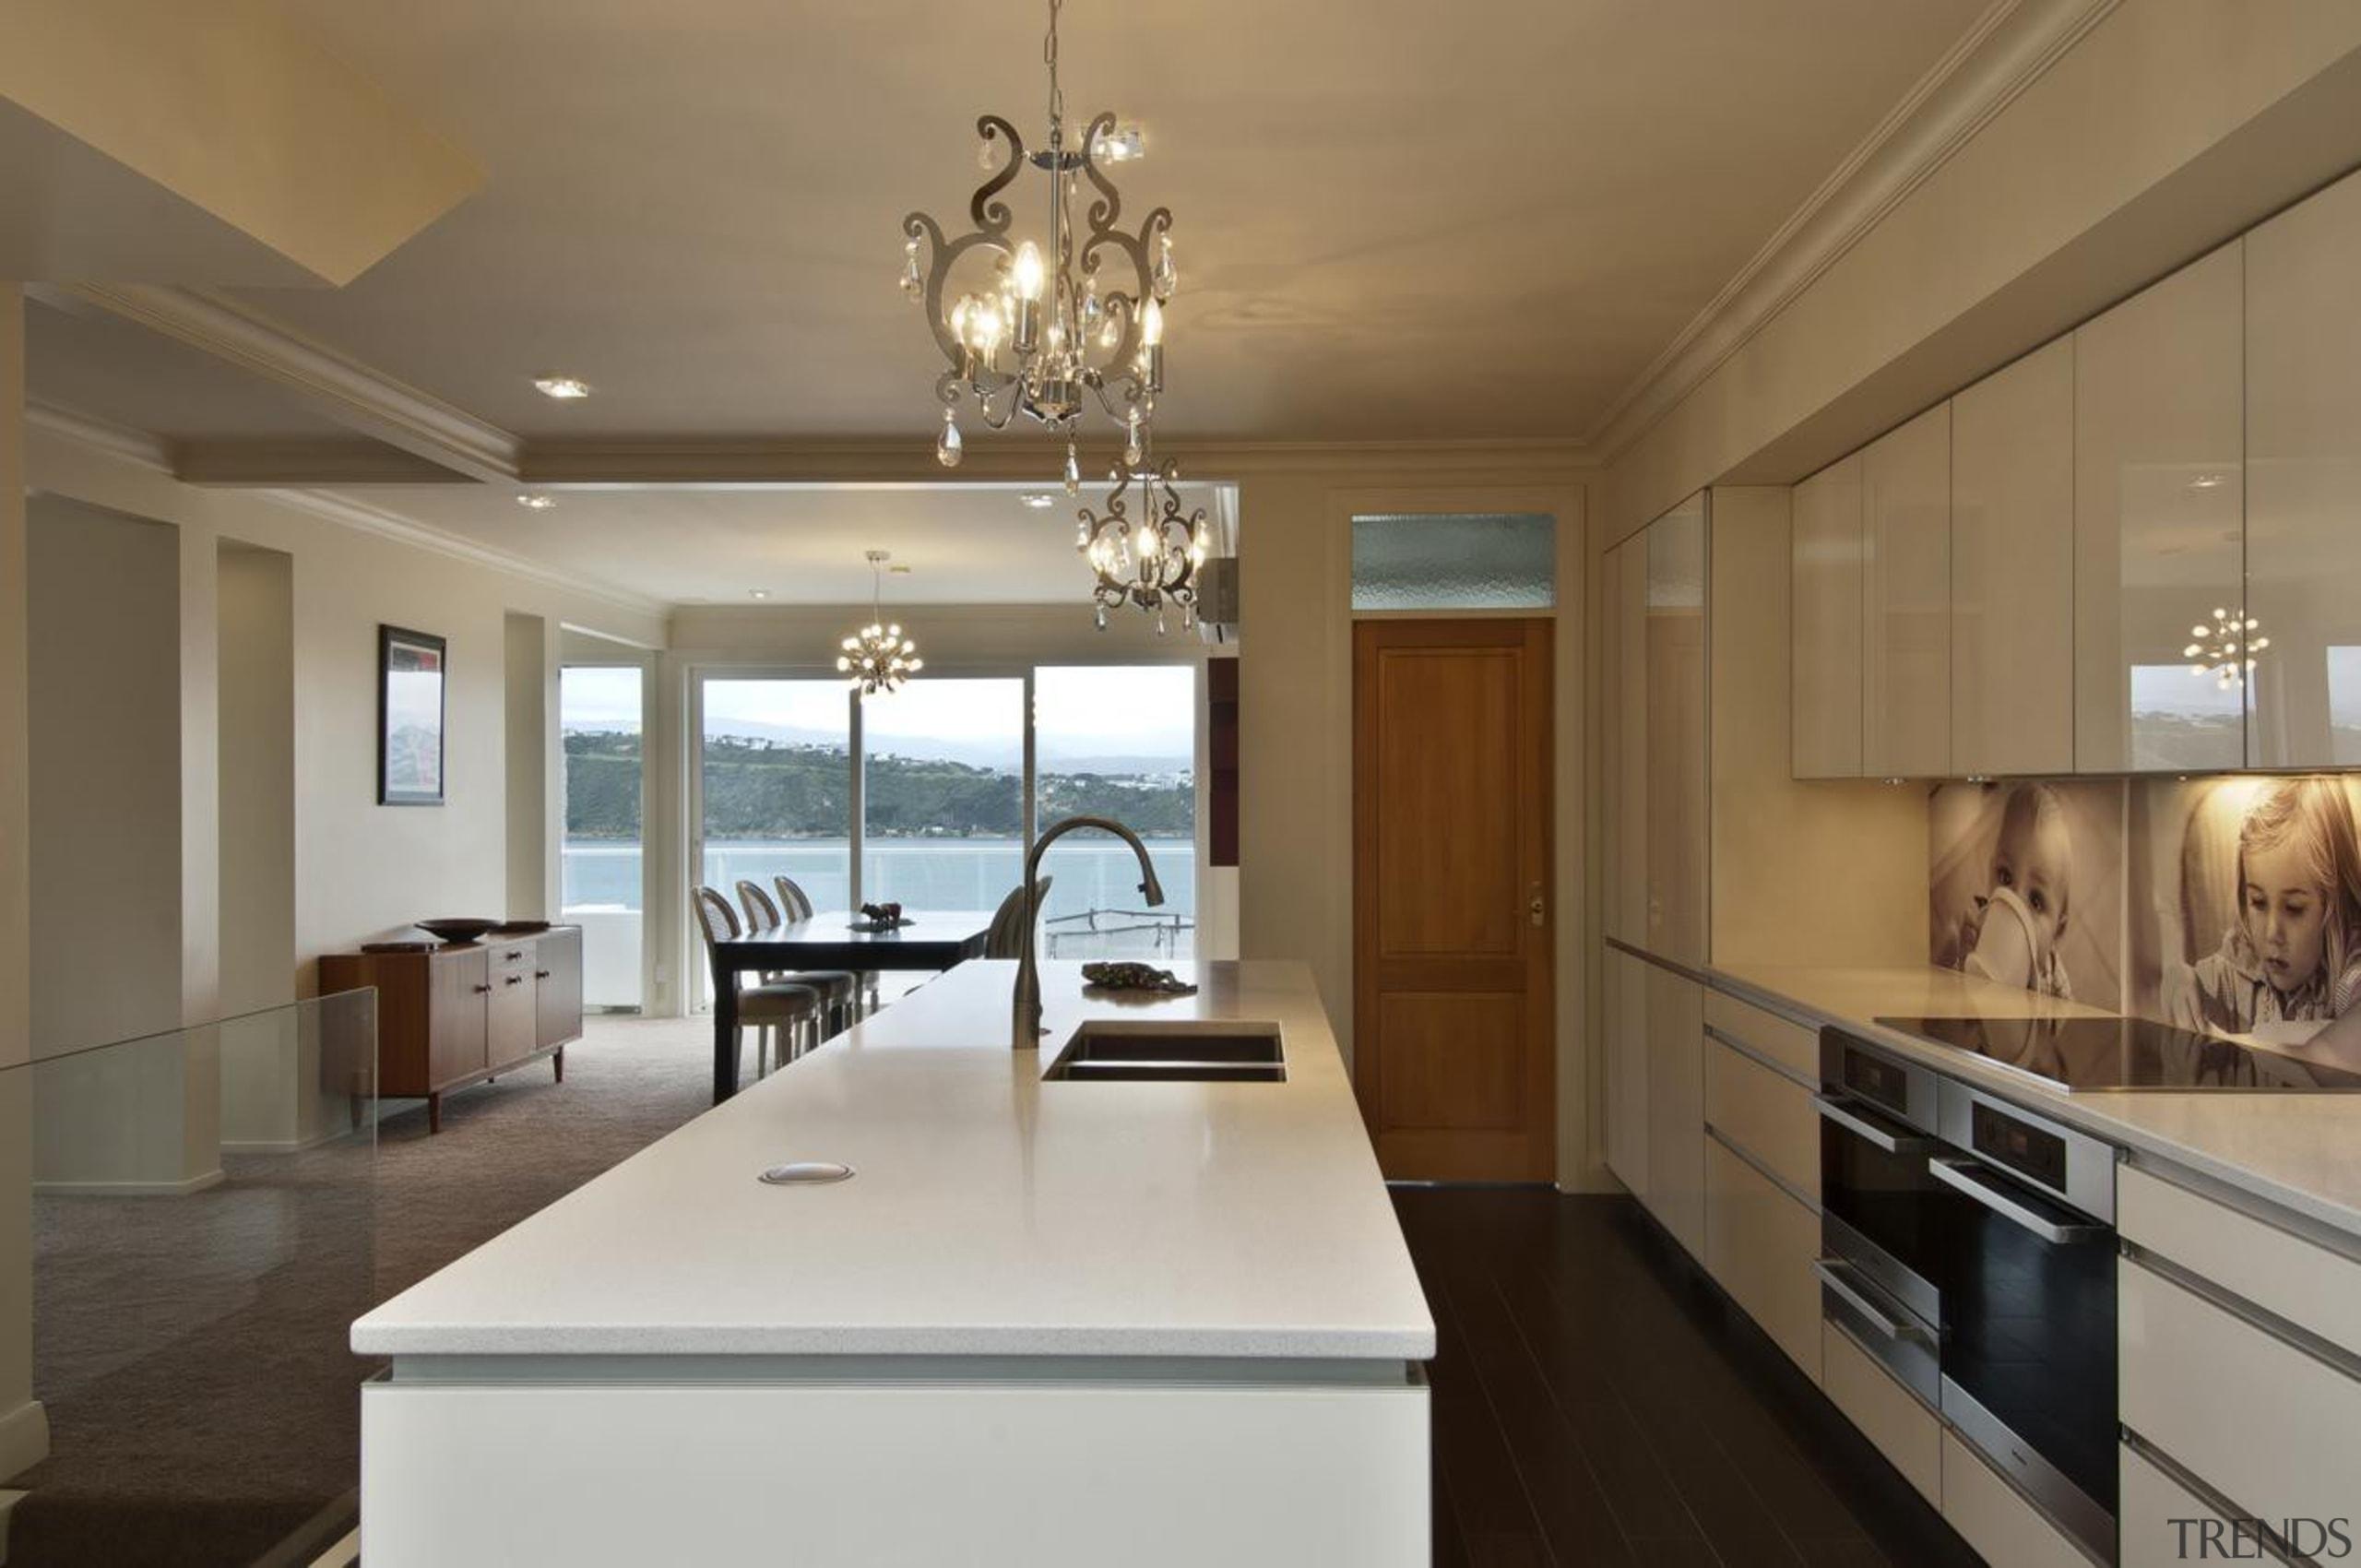 Hataitai Kitchen - Hataitai Kitchen - ceiling | ceiling, countertop, cuisine classique, interior design, kitchen, real estate, room, window, brown, gray